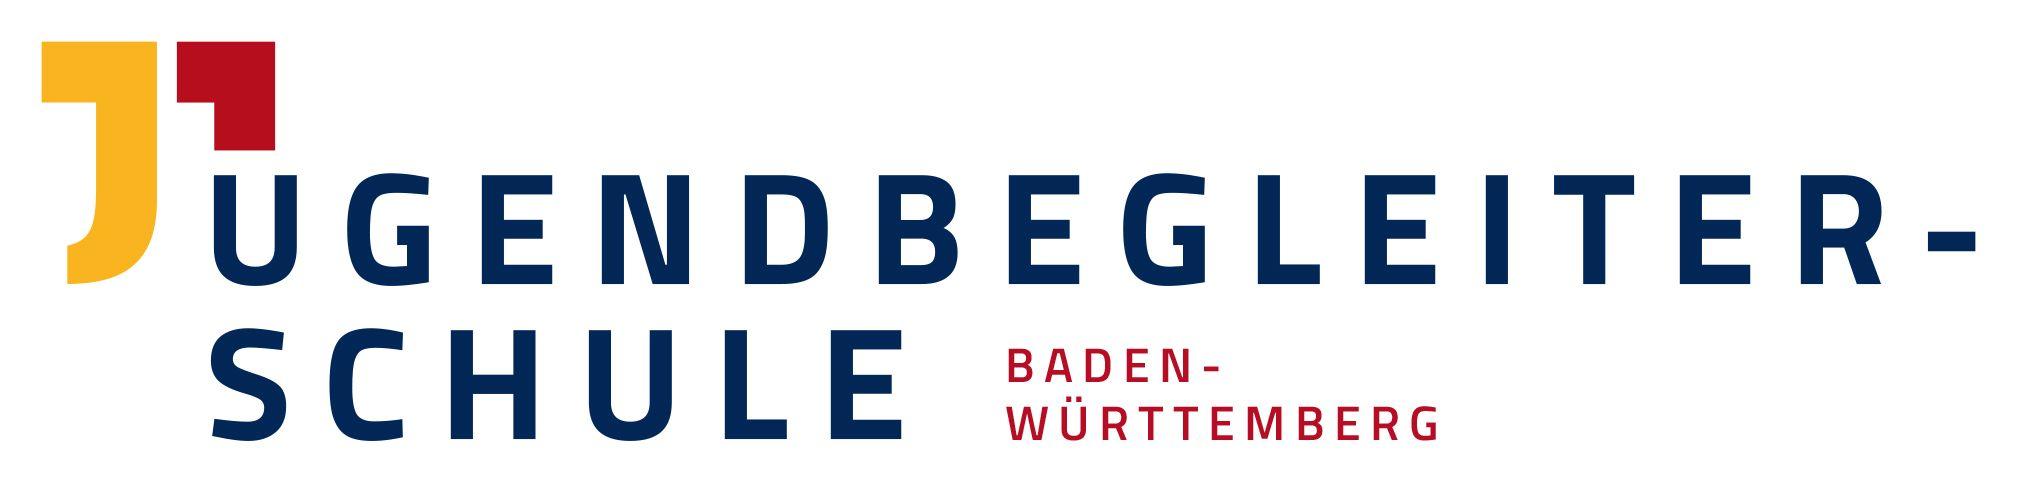 Jugendbegleiter_Logo